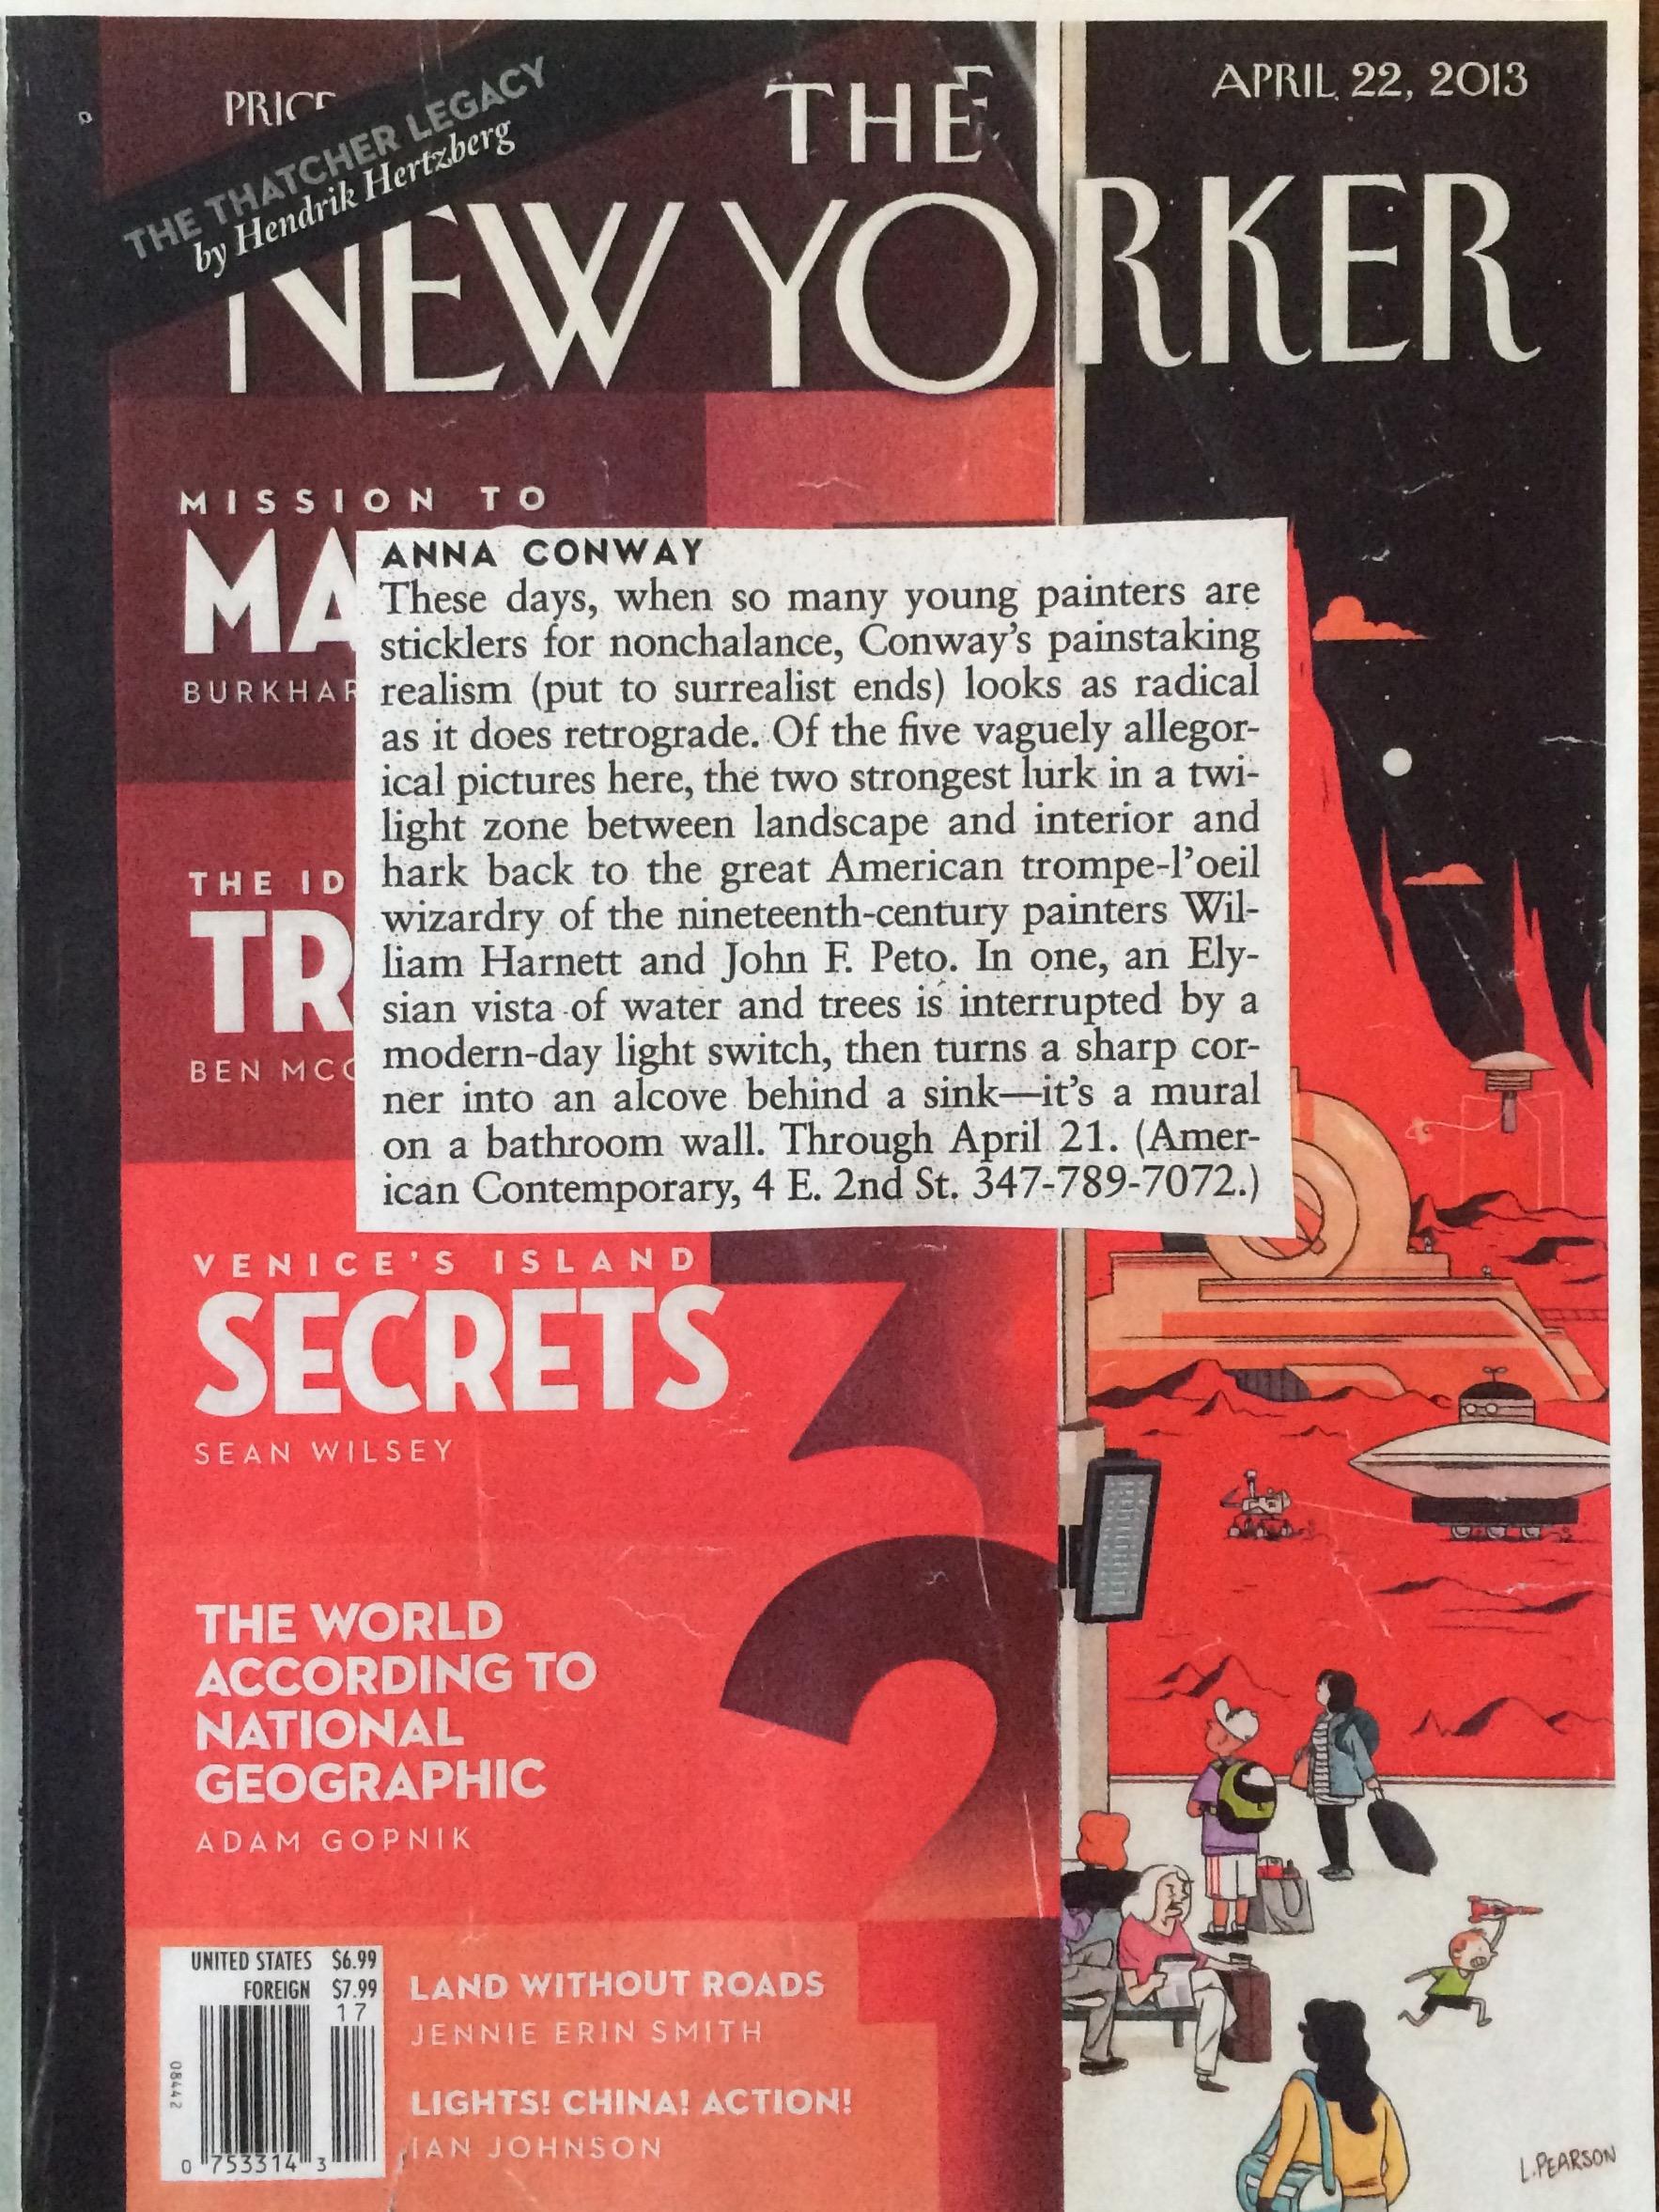 New Yorker, April 2013